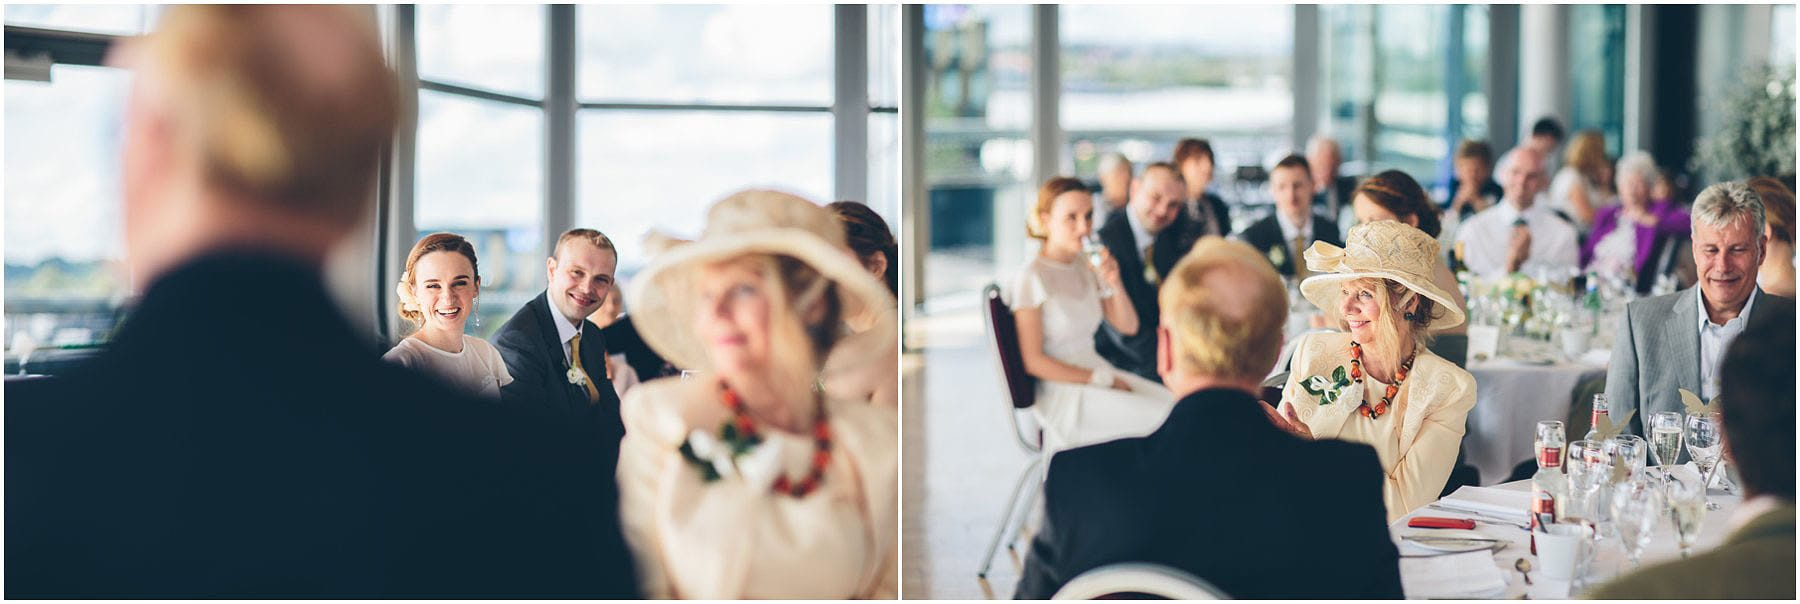 Lowry_Theatre_Wedding_Photography_0101